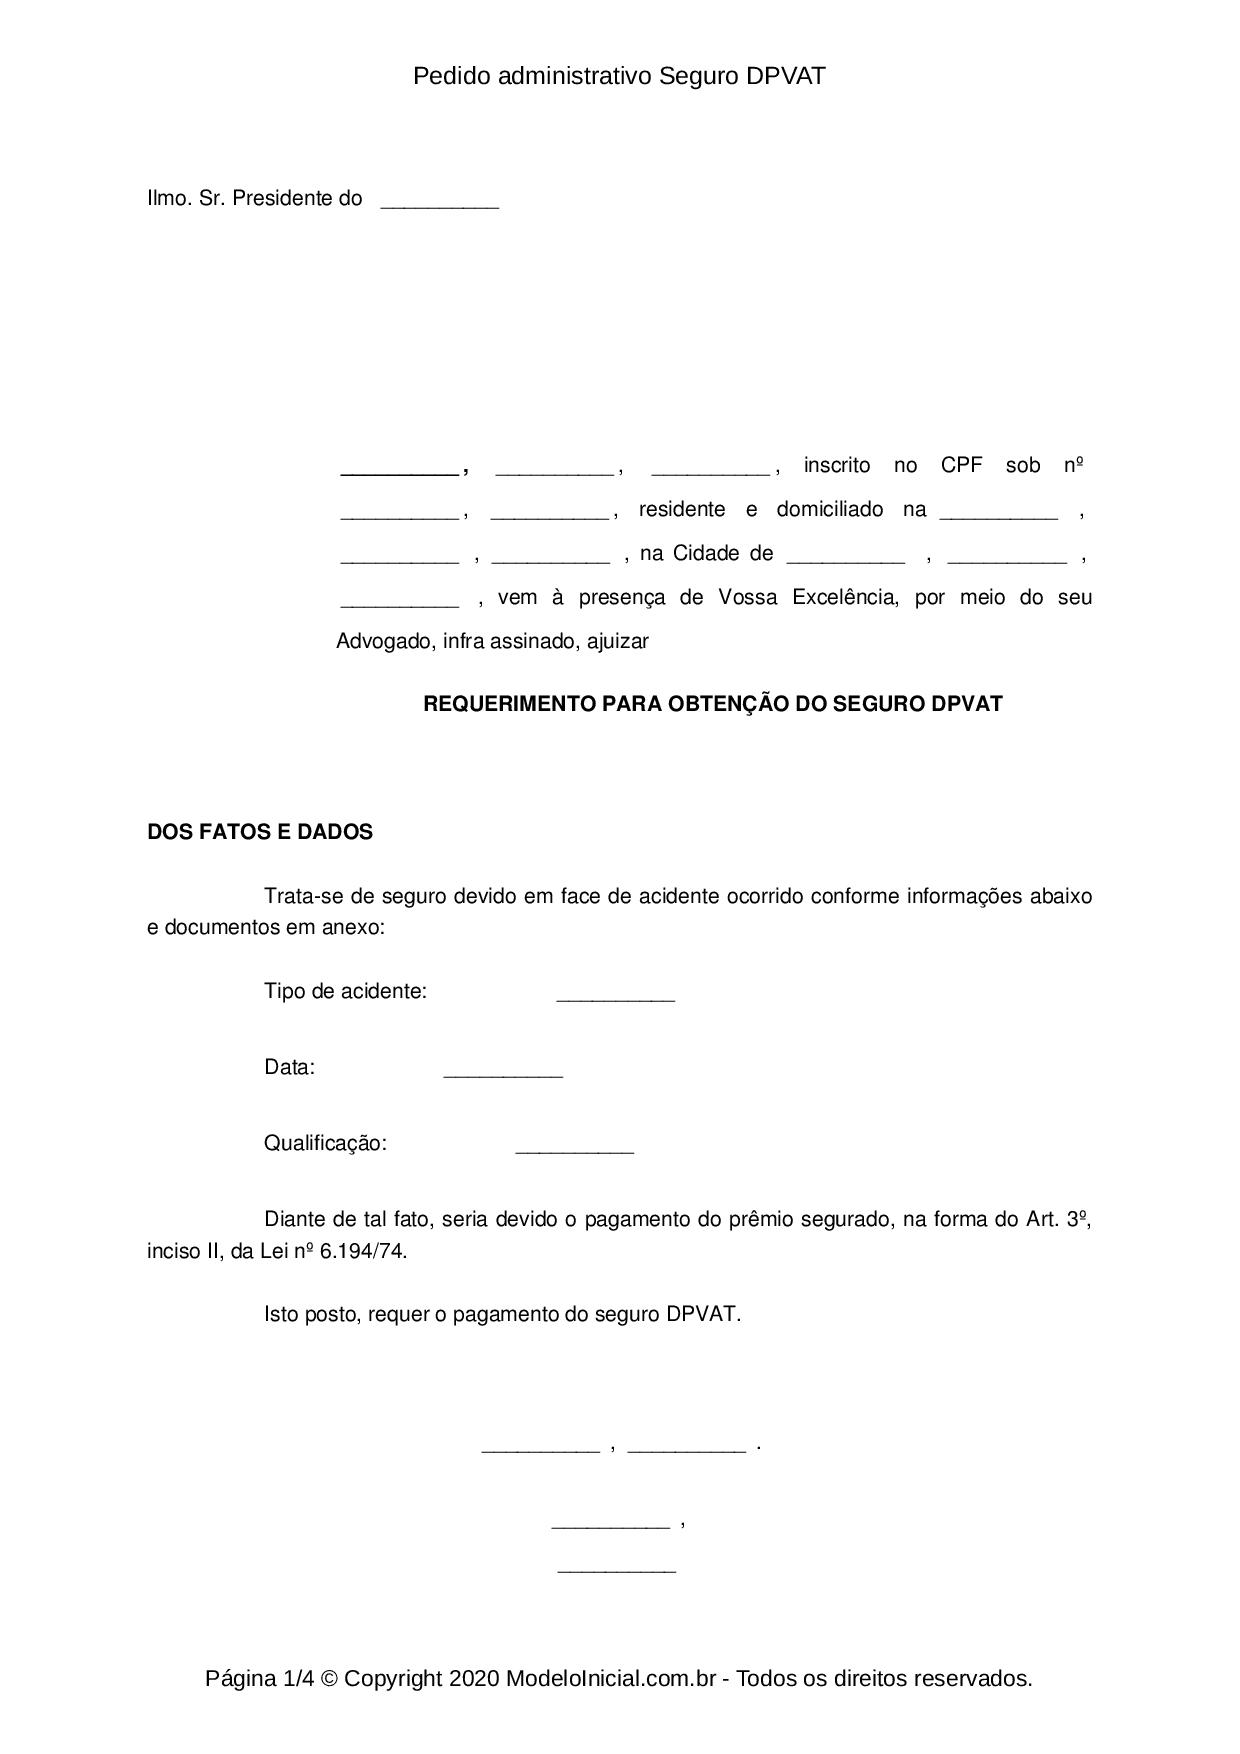 Modelo Pedido Administrativo Seguro Dpvat